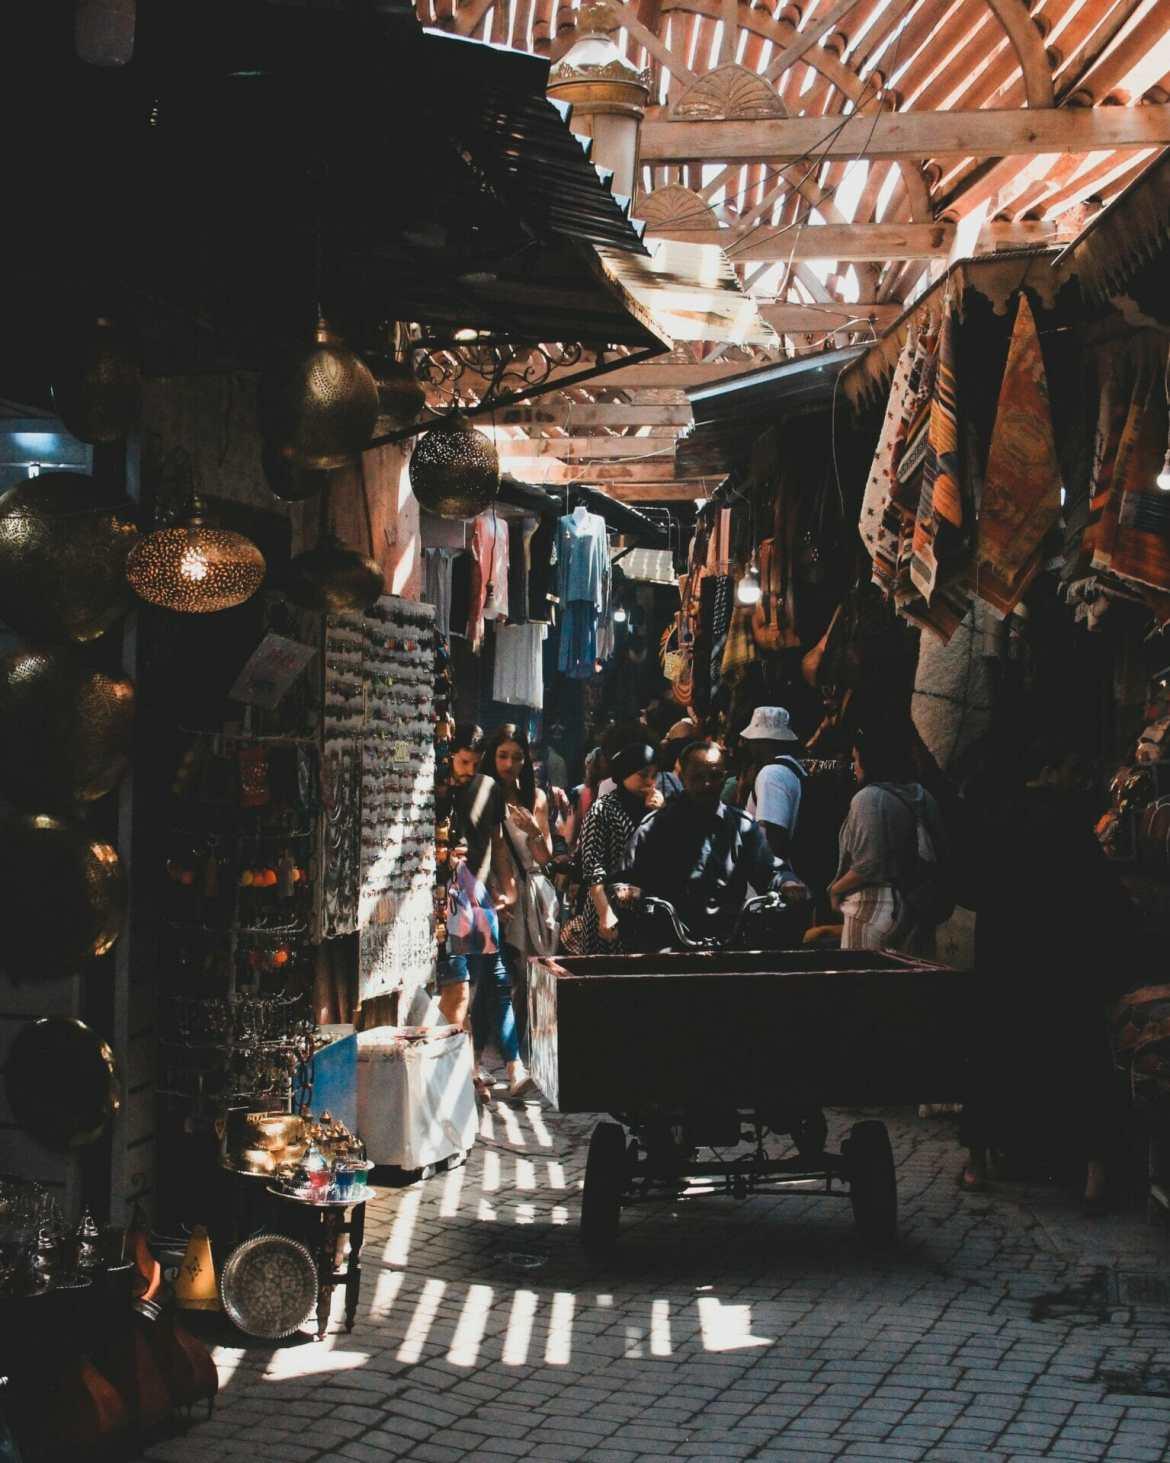 Busy souks of Marrakech Morocco